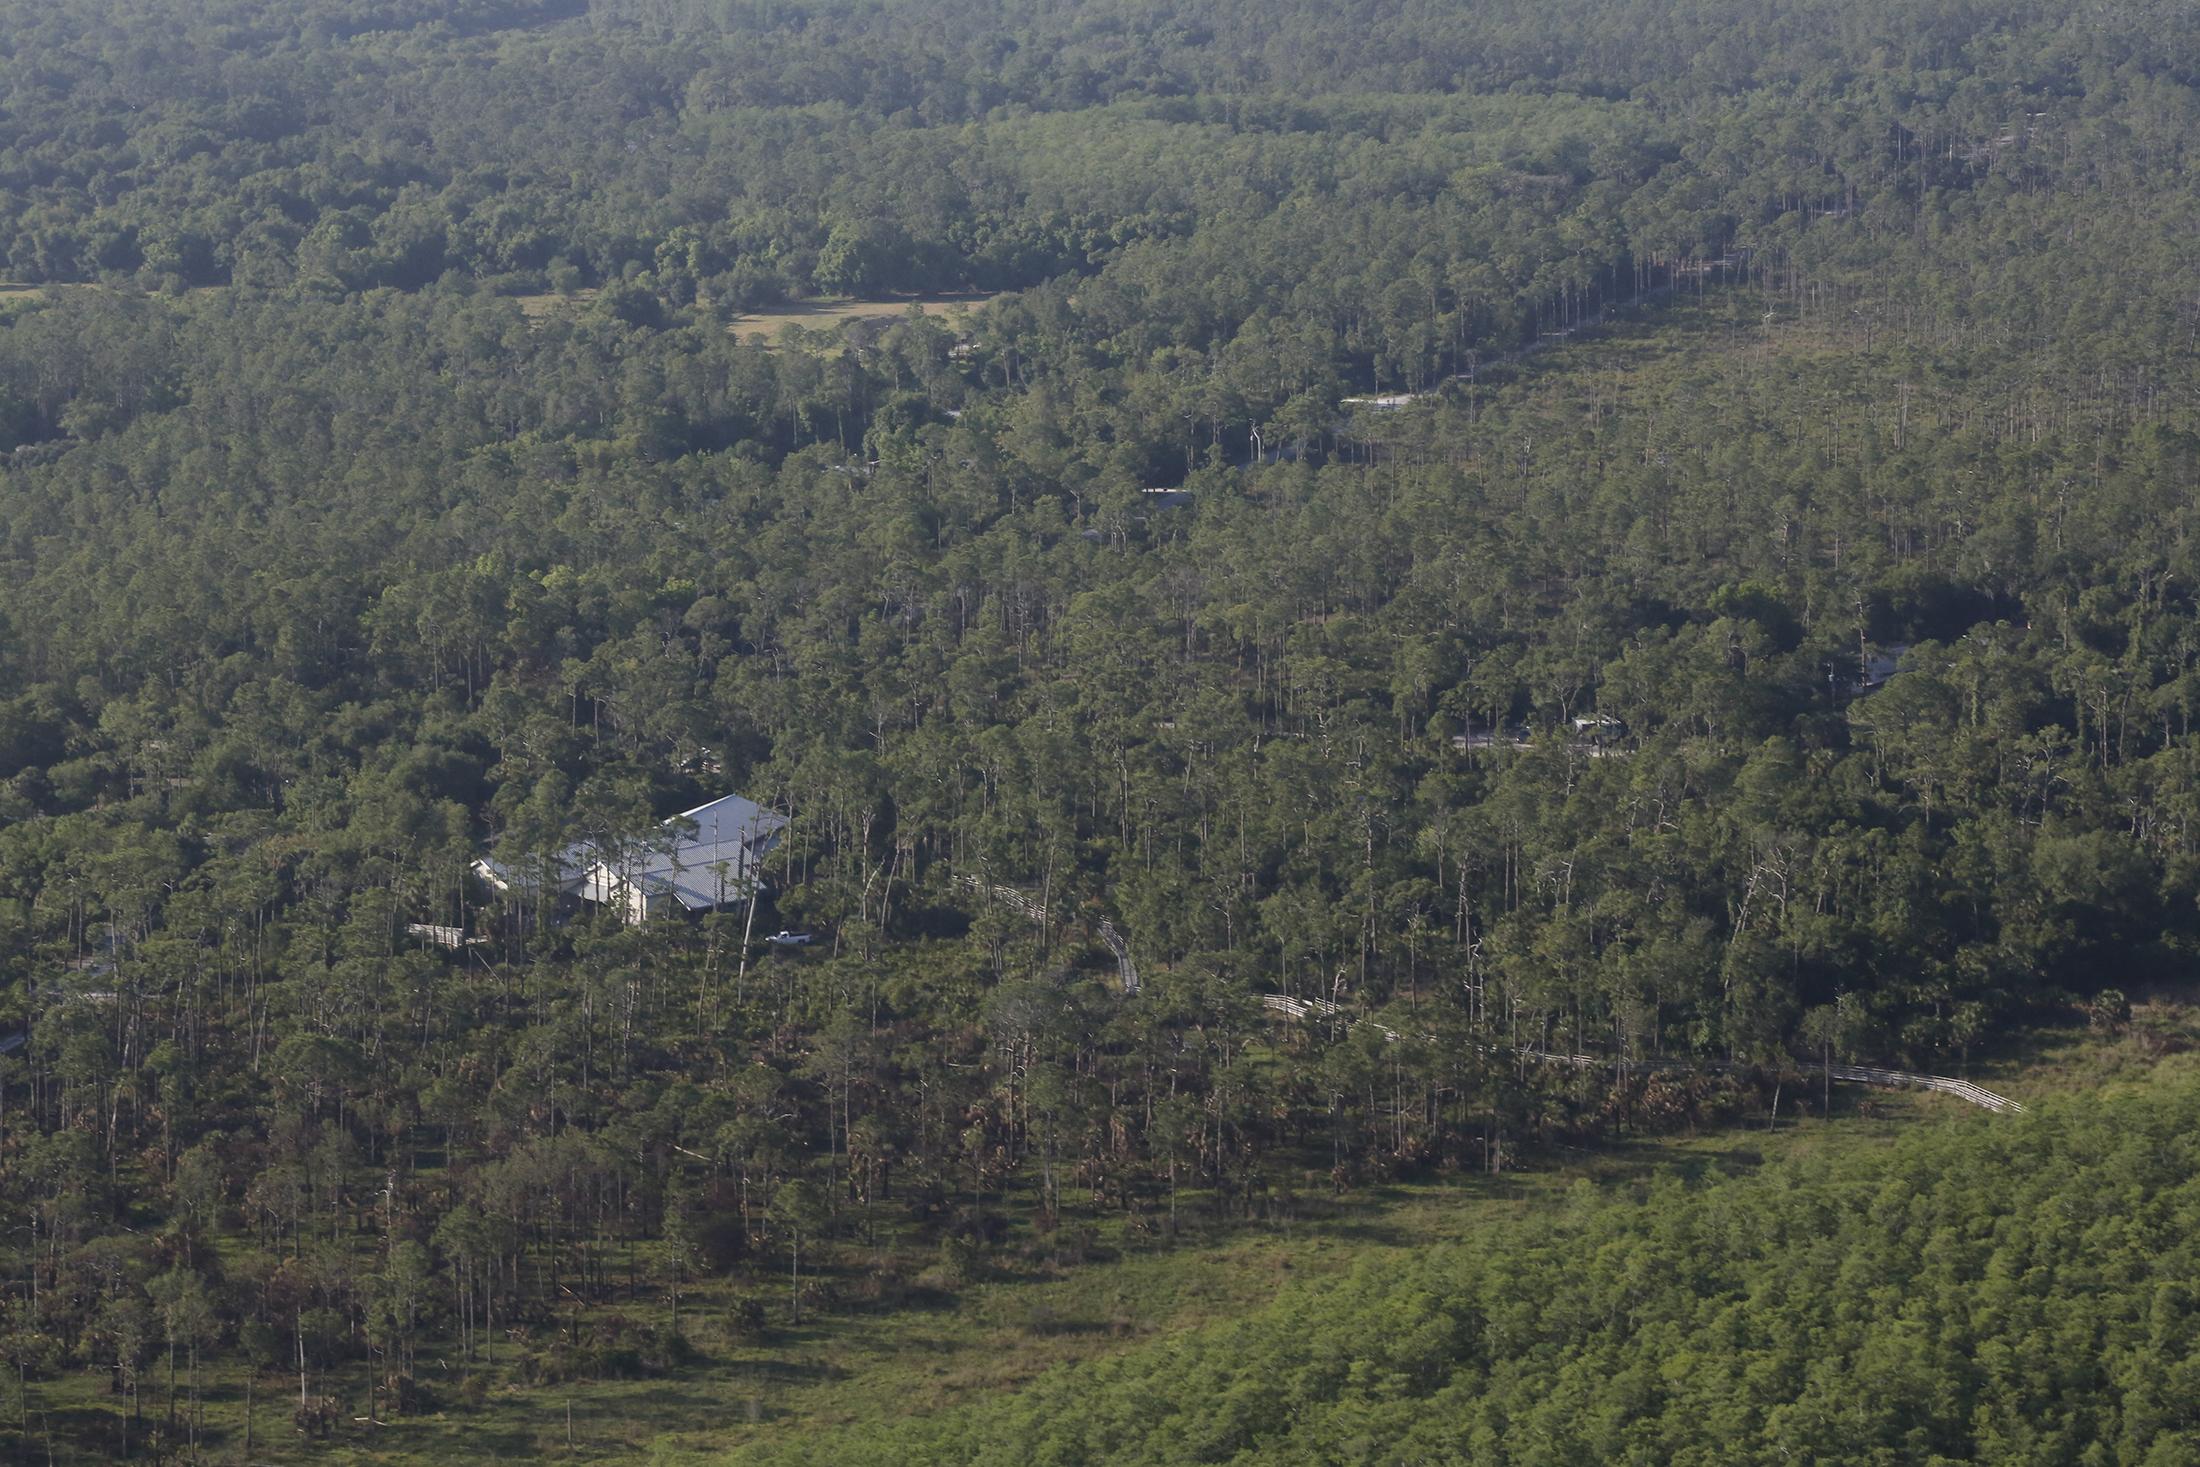 Aerial view of Blair Center